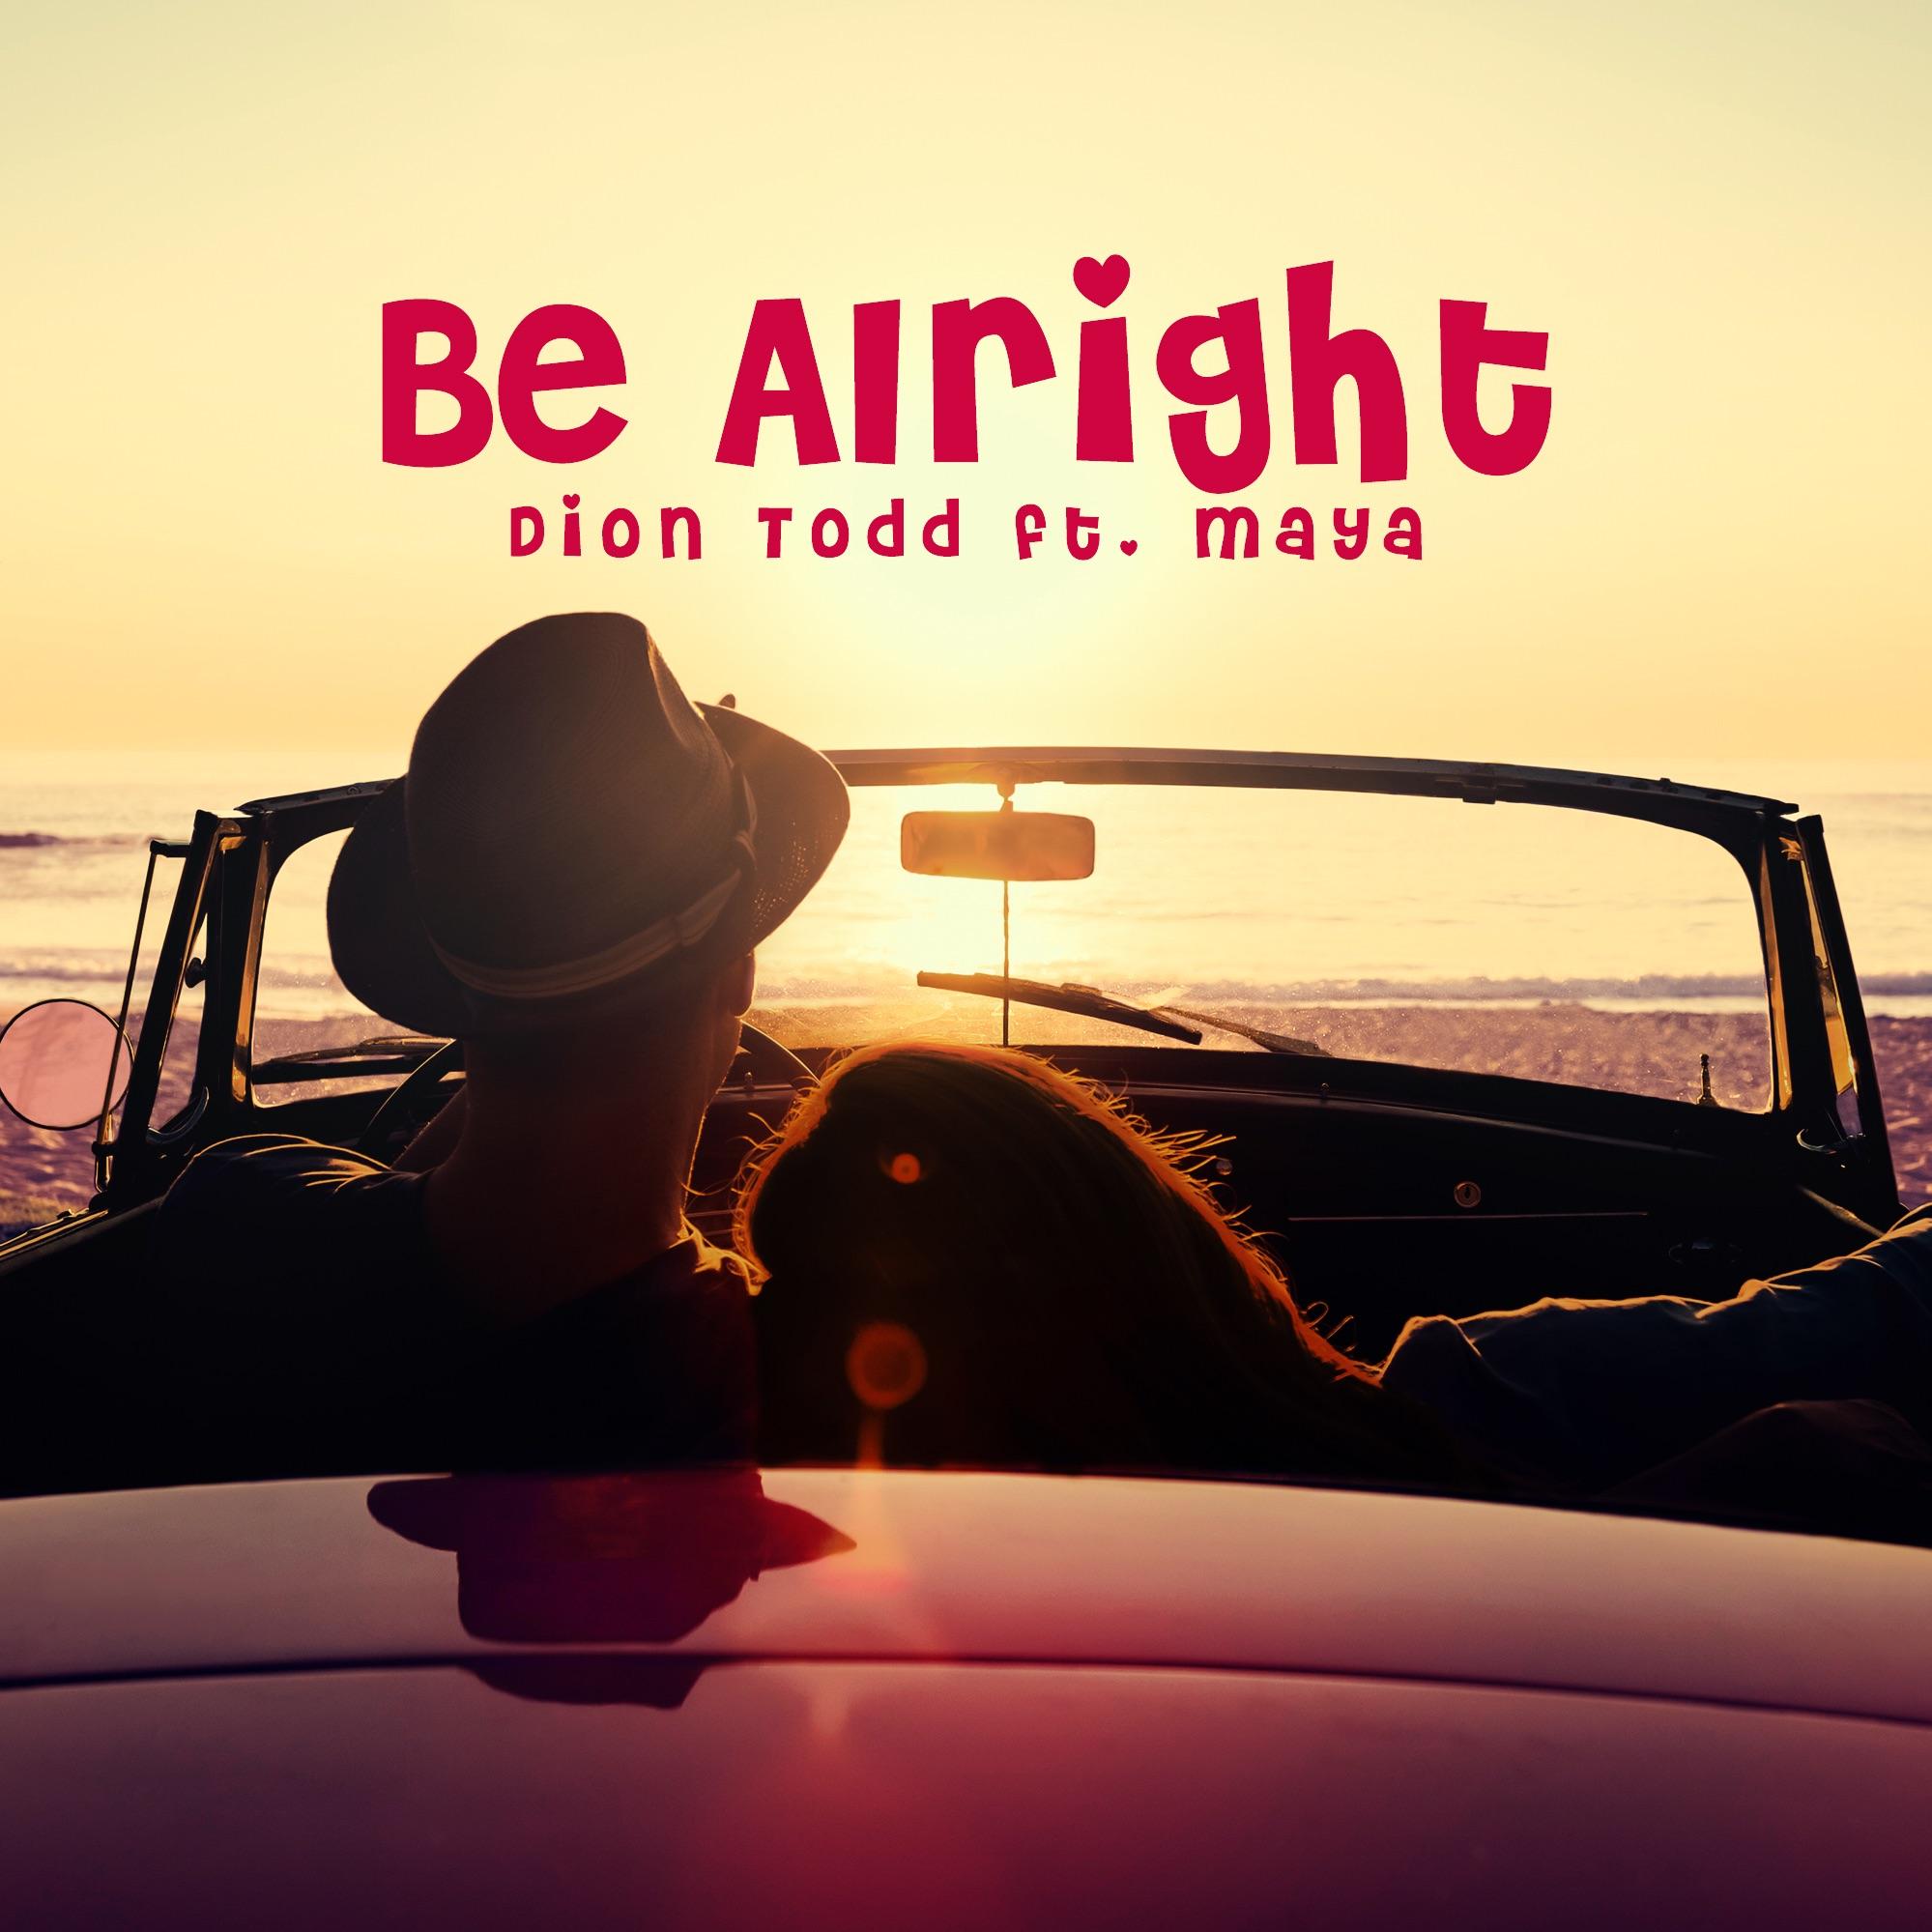 bealright.jpg